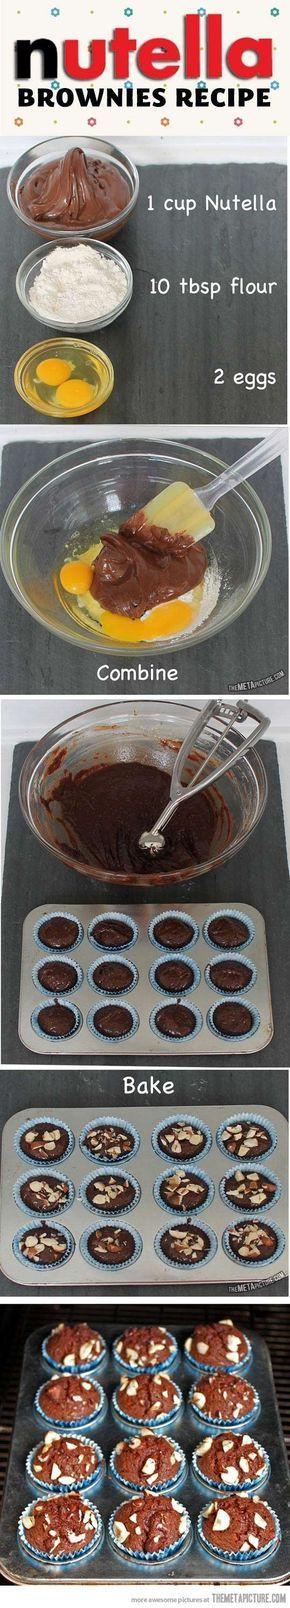 Nutella Brownie Recipe desert nutella recipe brownies recipes easy recipes food tutorials food tutorial